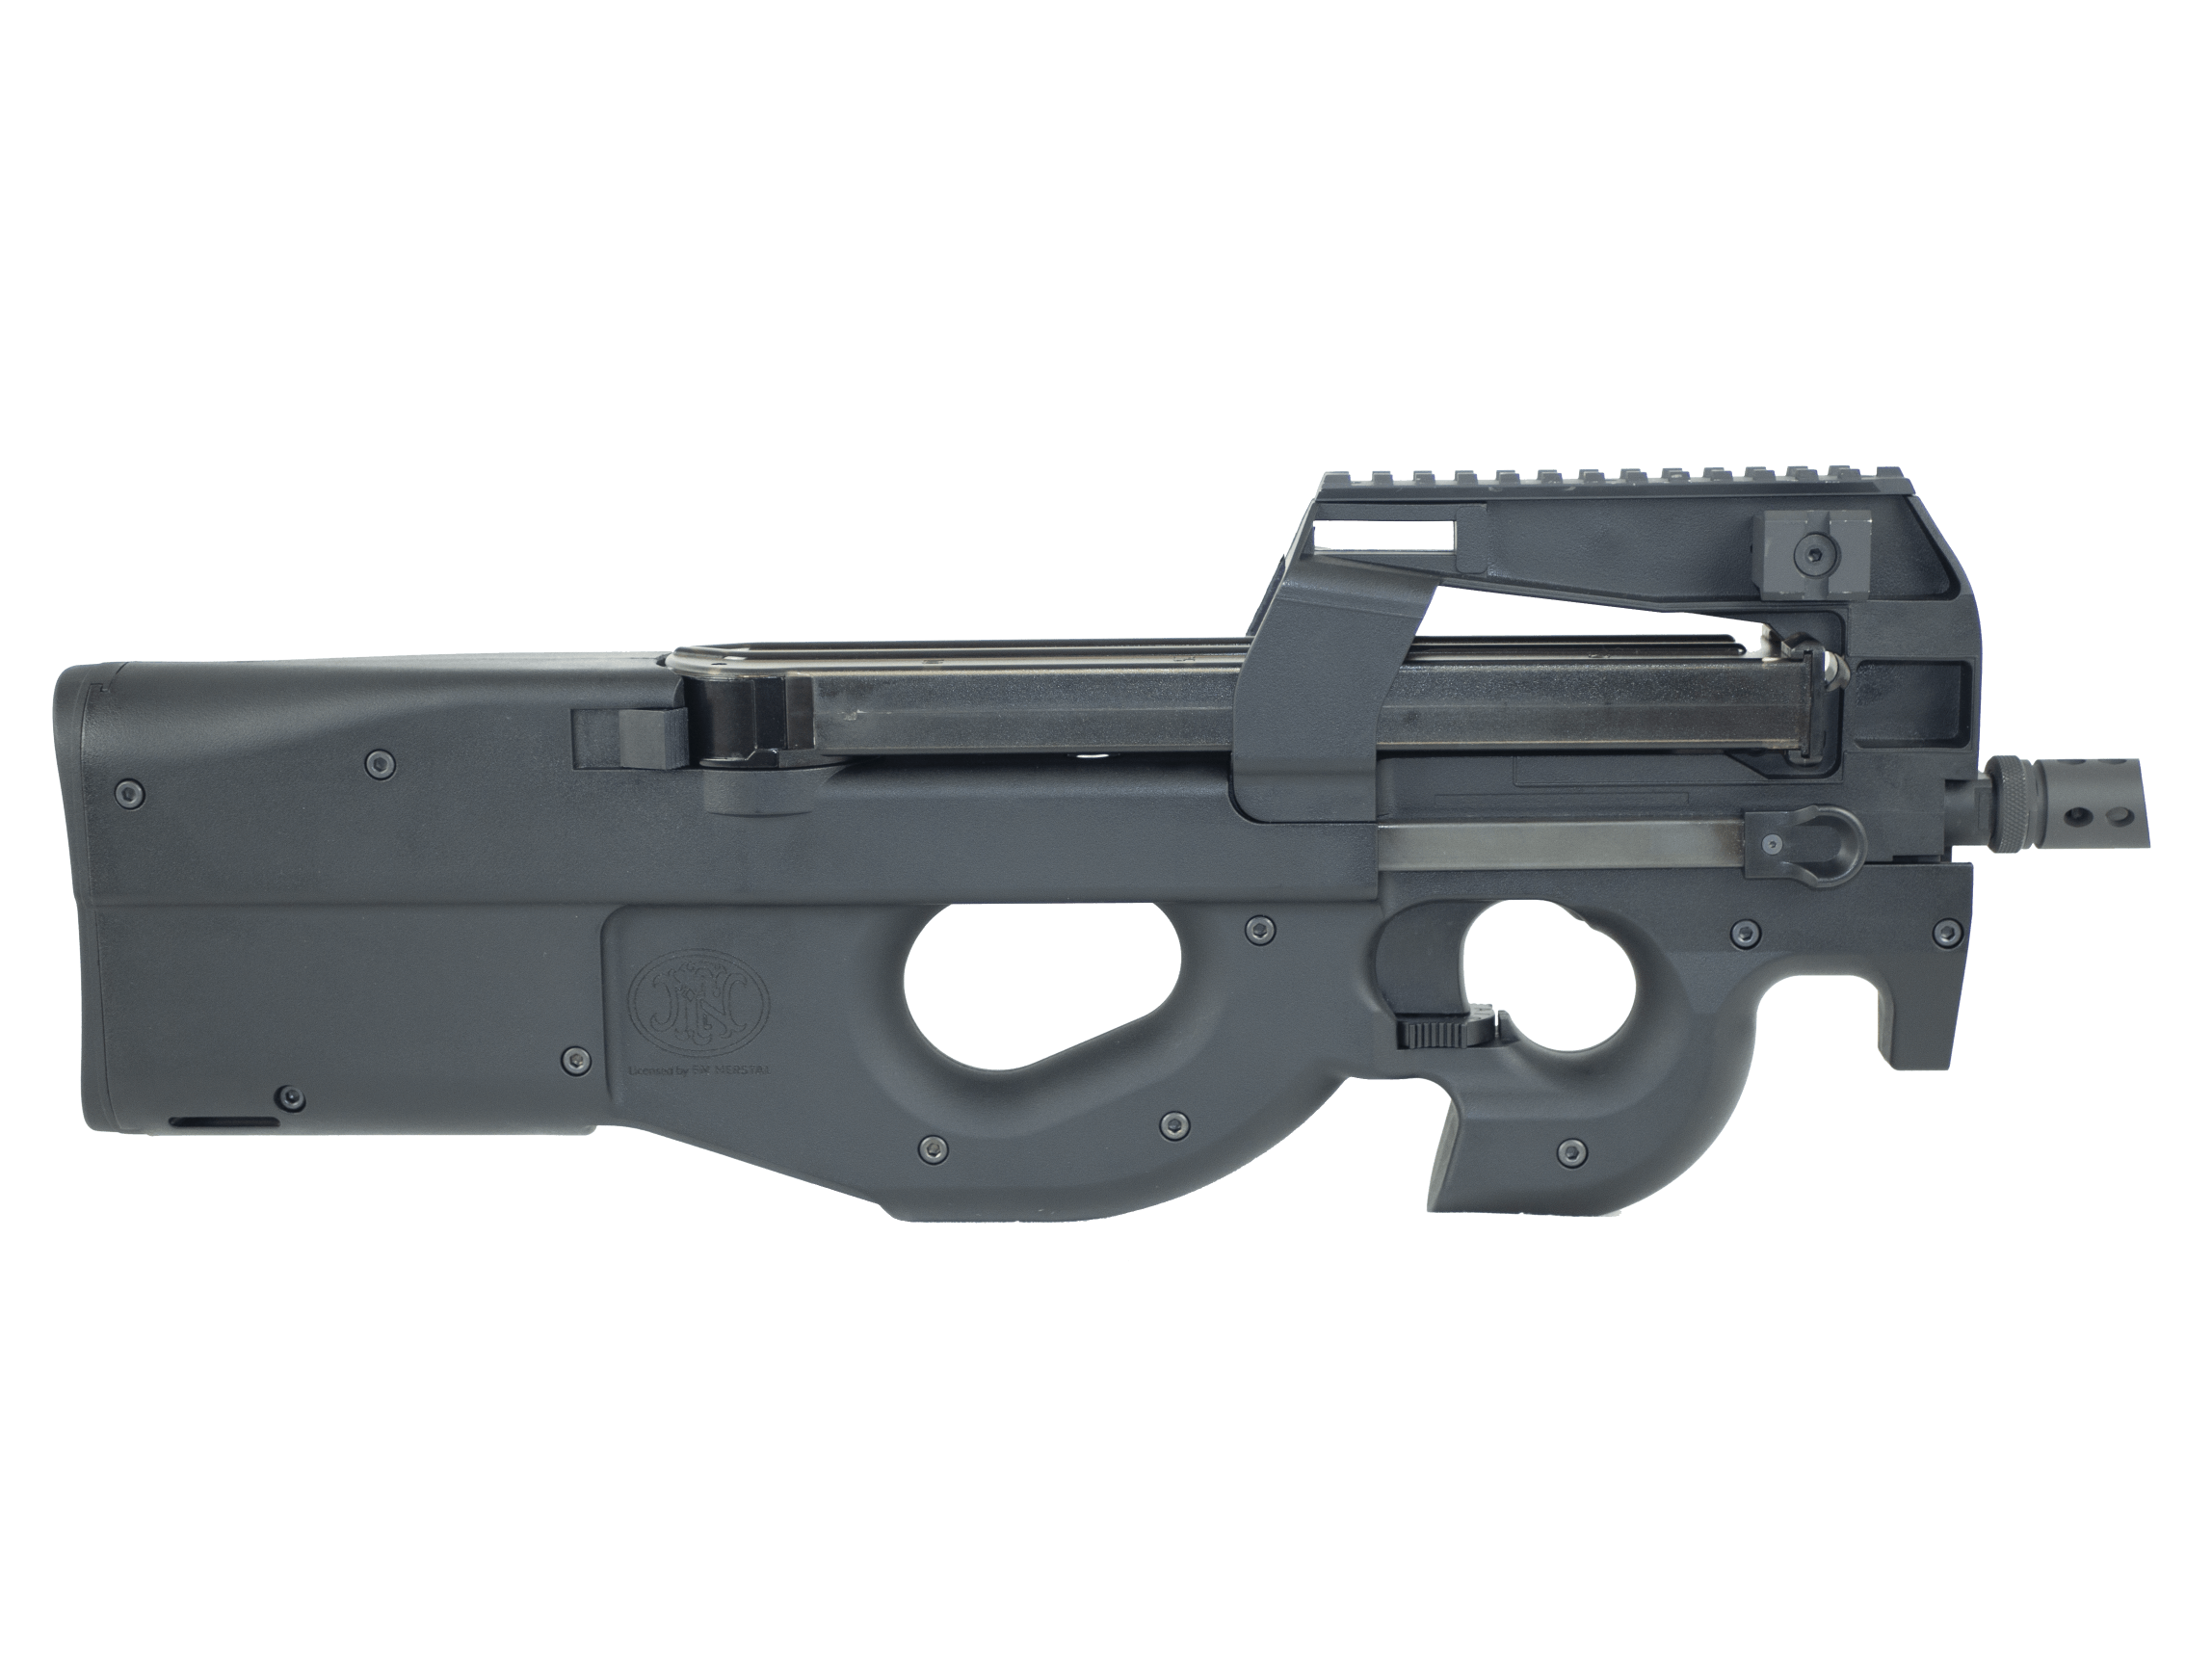 Billede af Cybergun, FN P90 GBBR